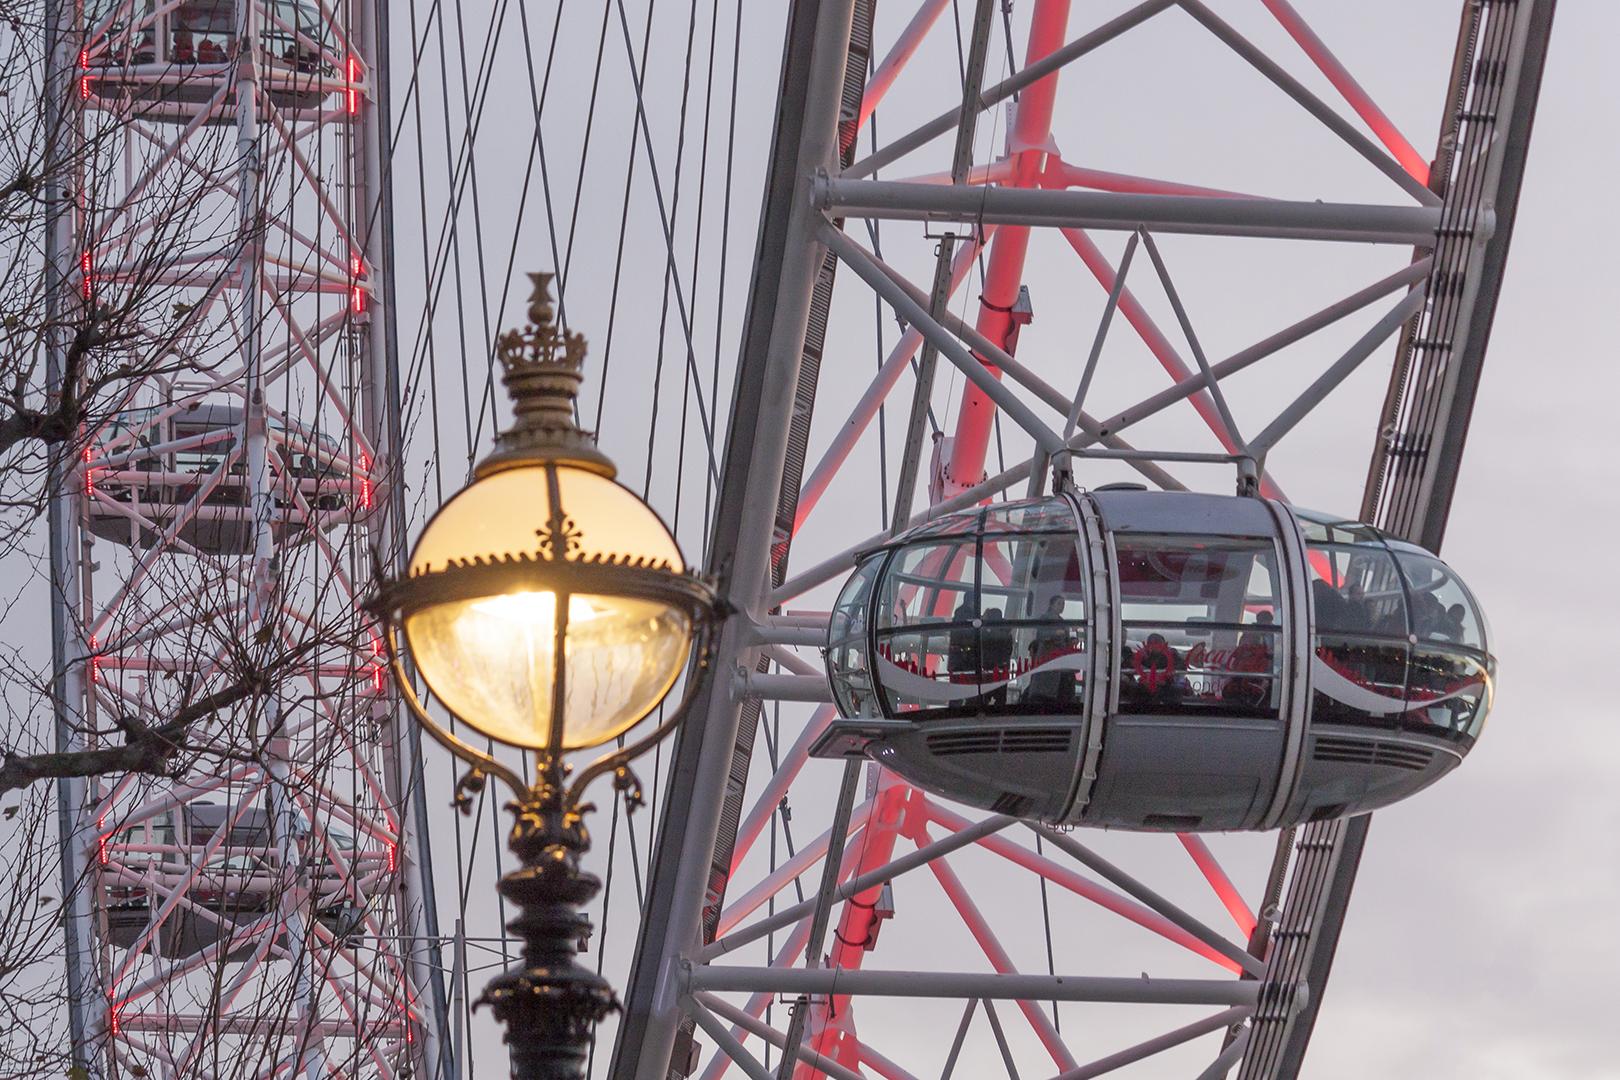 london eye lamp.jpg